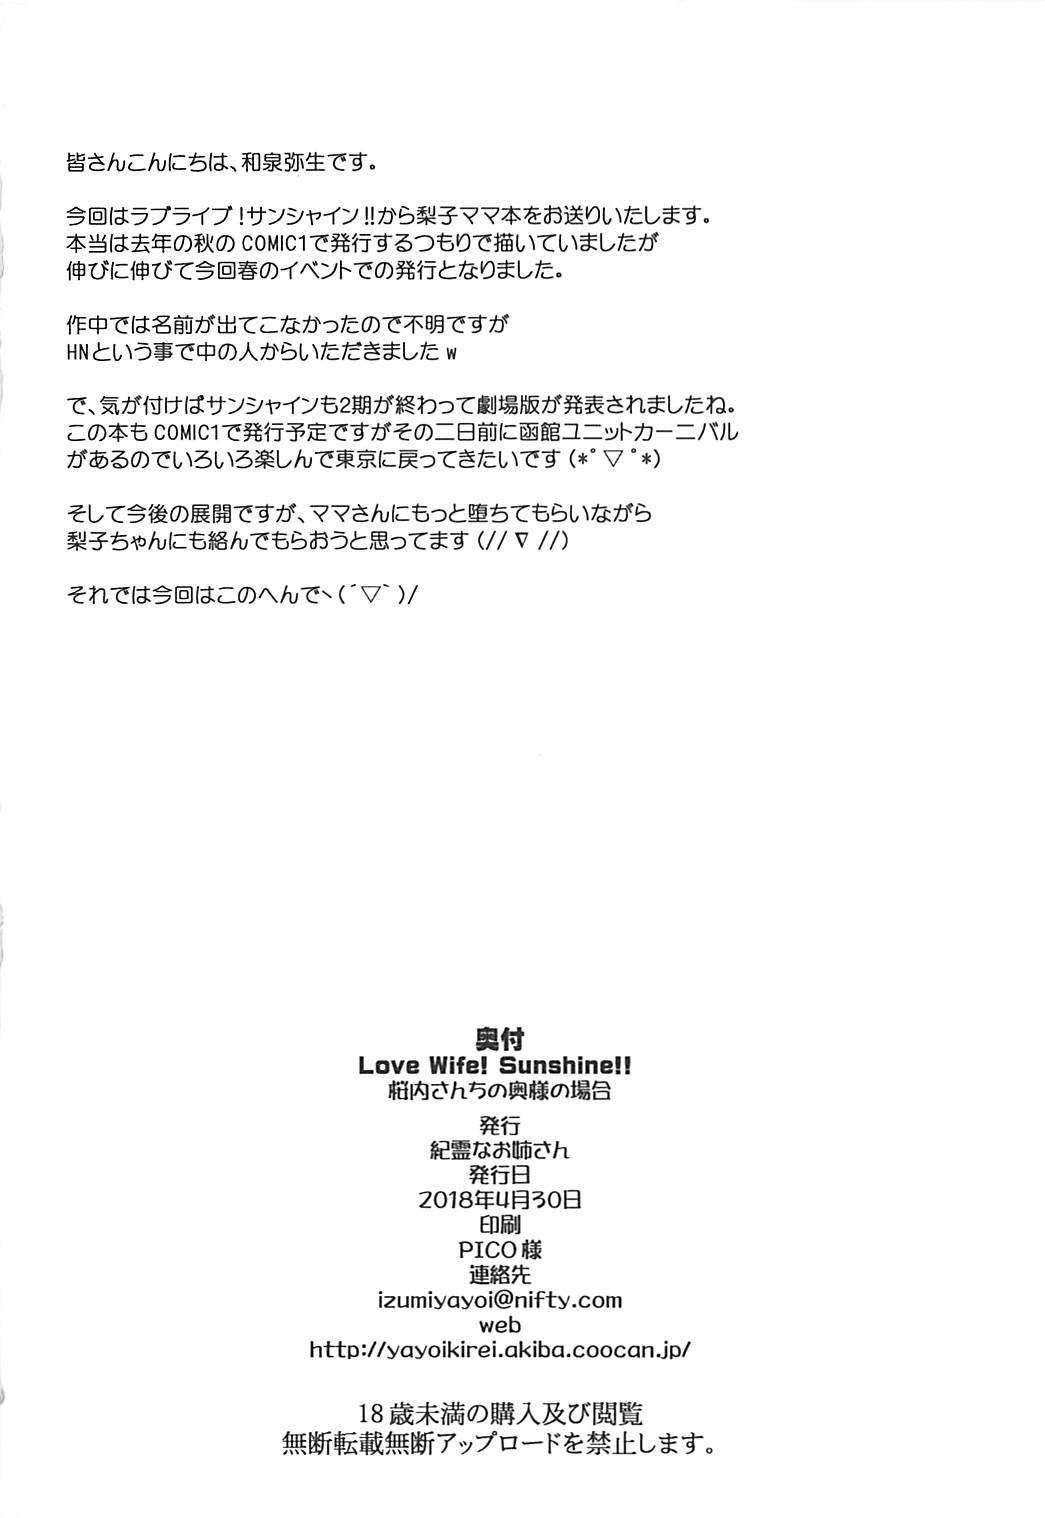 (COMIC1☆13) [Kirei na Oneesan (Izumi Yayoi)] Love Wife! Sunshine!! Sakurauchi-san-chi no Oku-sama no Baai (Love Live! Sunshine!!) 28